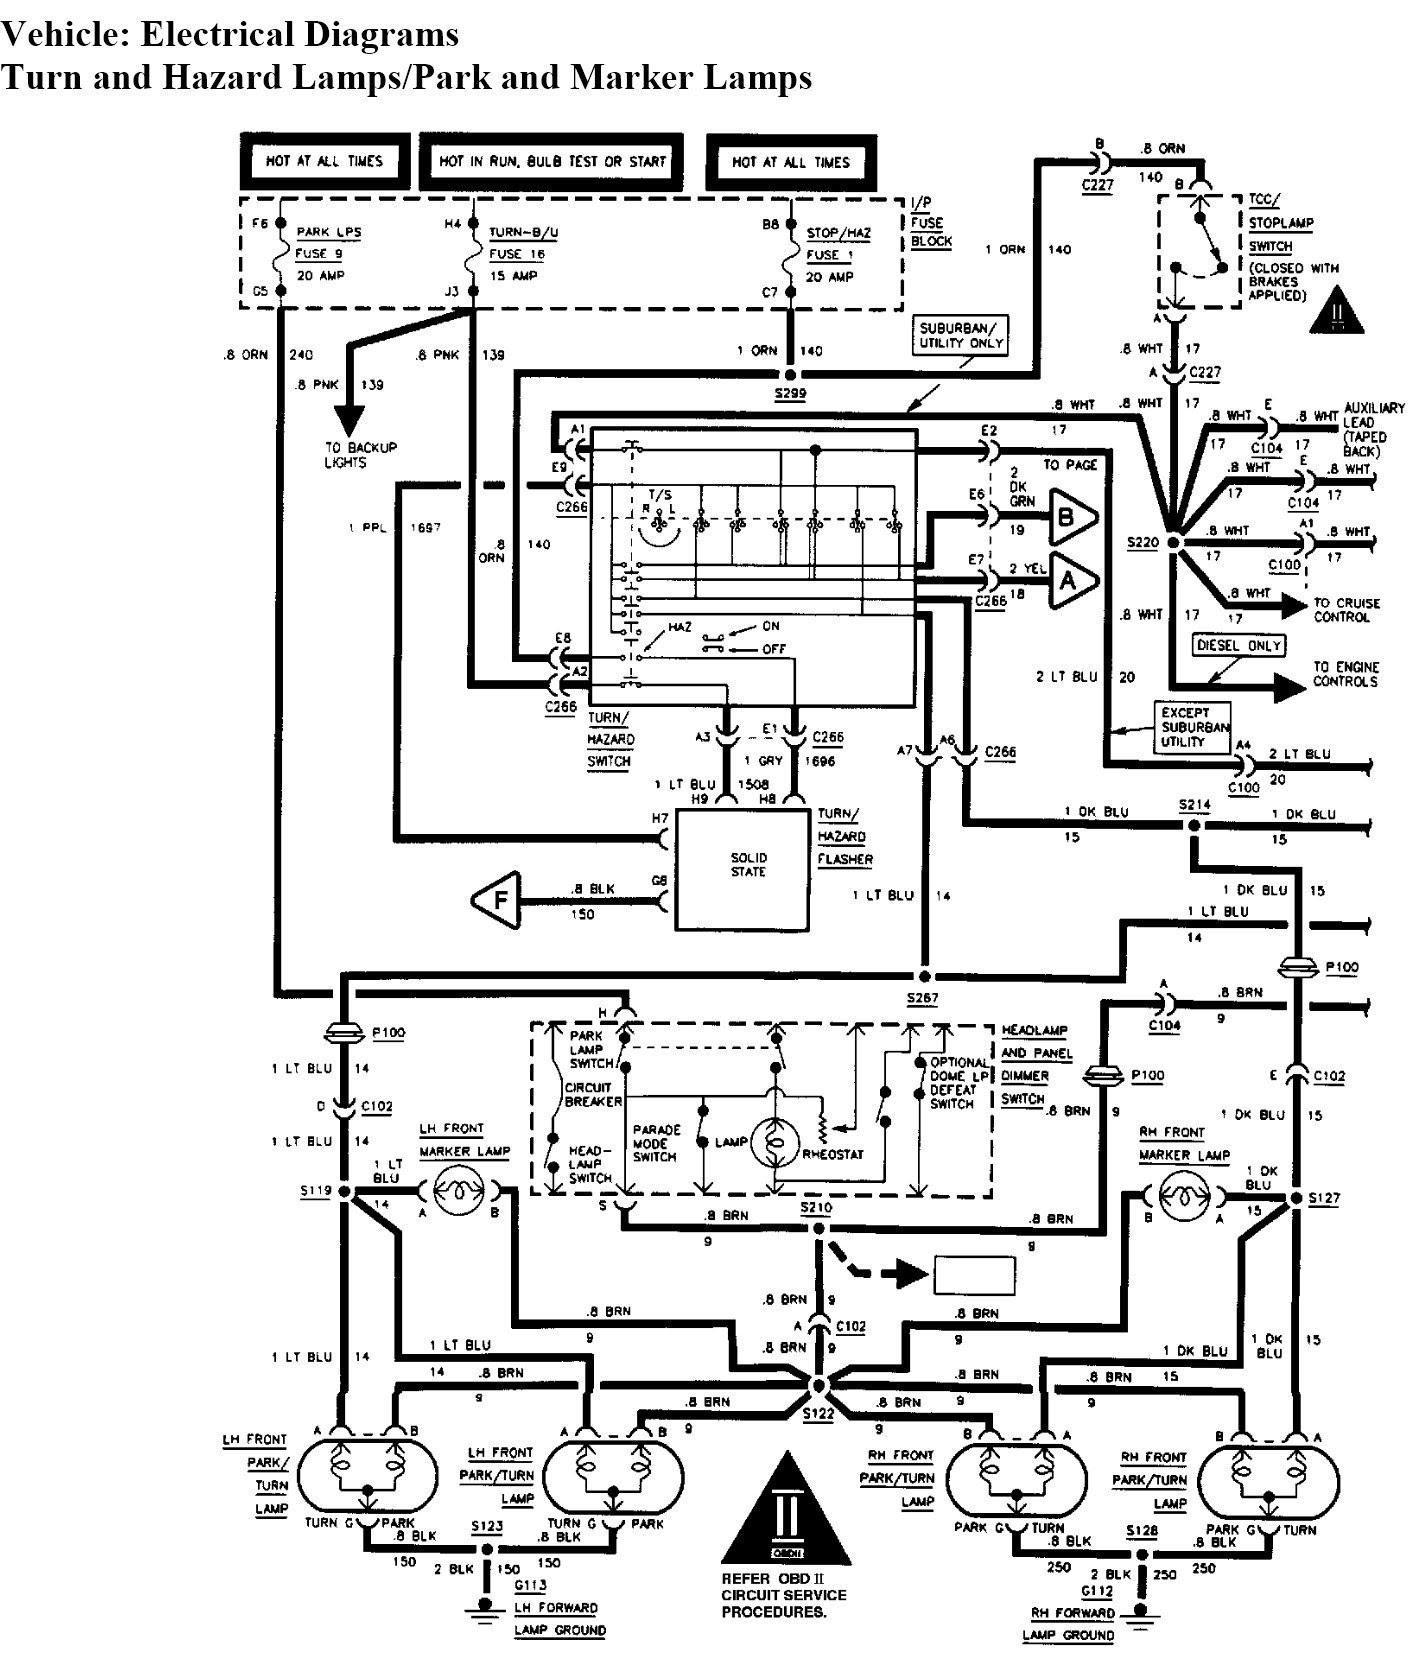 Gm 2500 Brake Light Switch Wiring Diagram Wiring Diagram United3 United3 Maceratadoc It